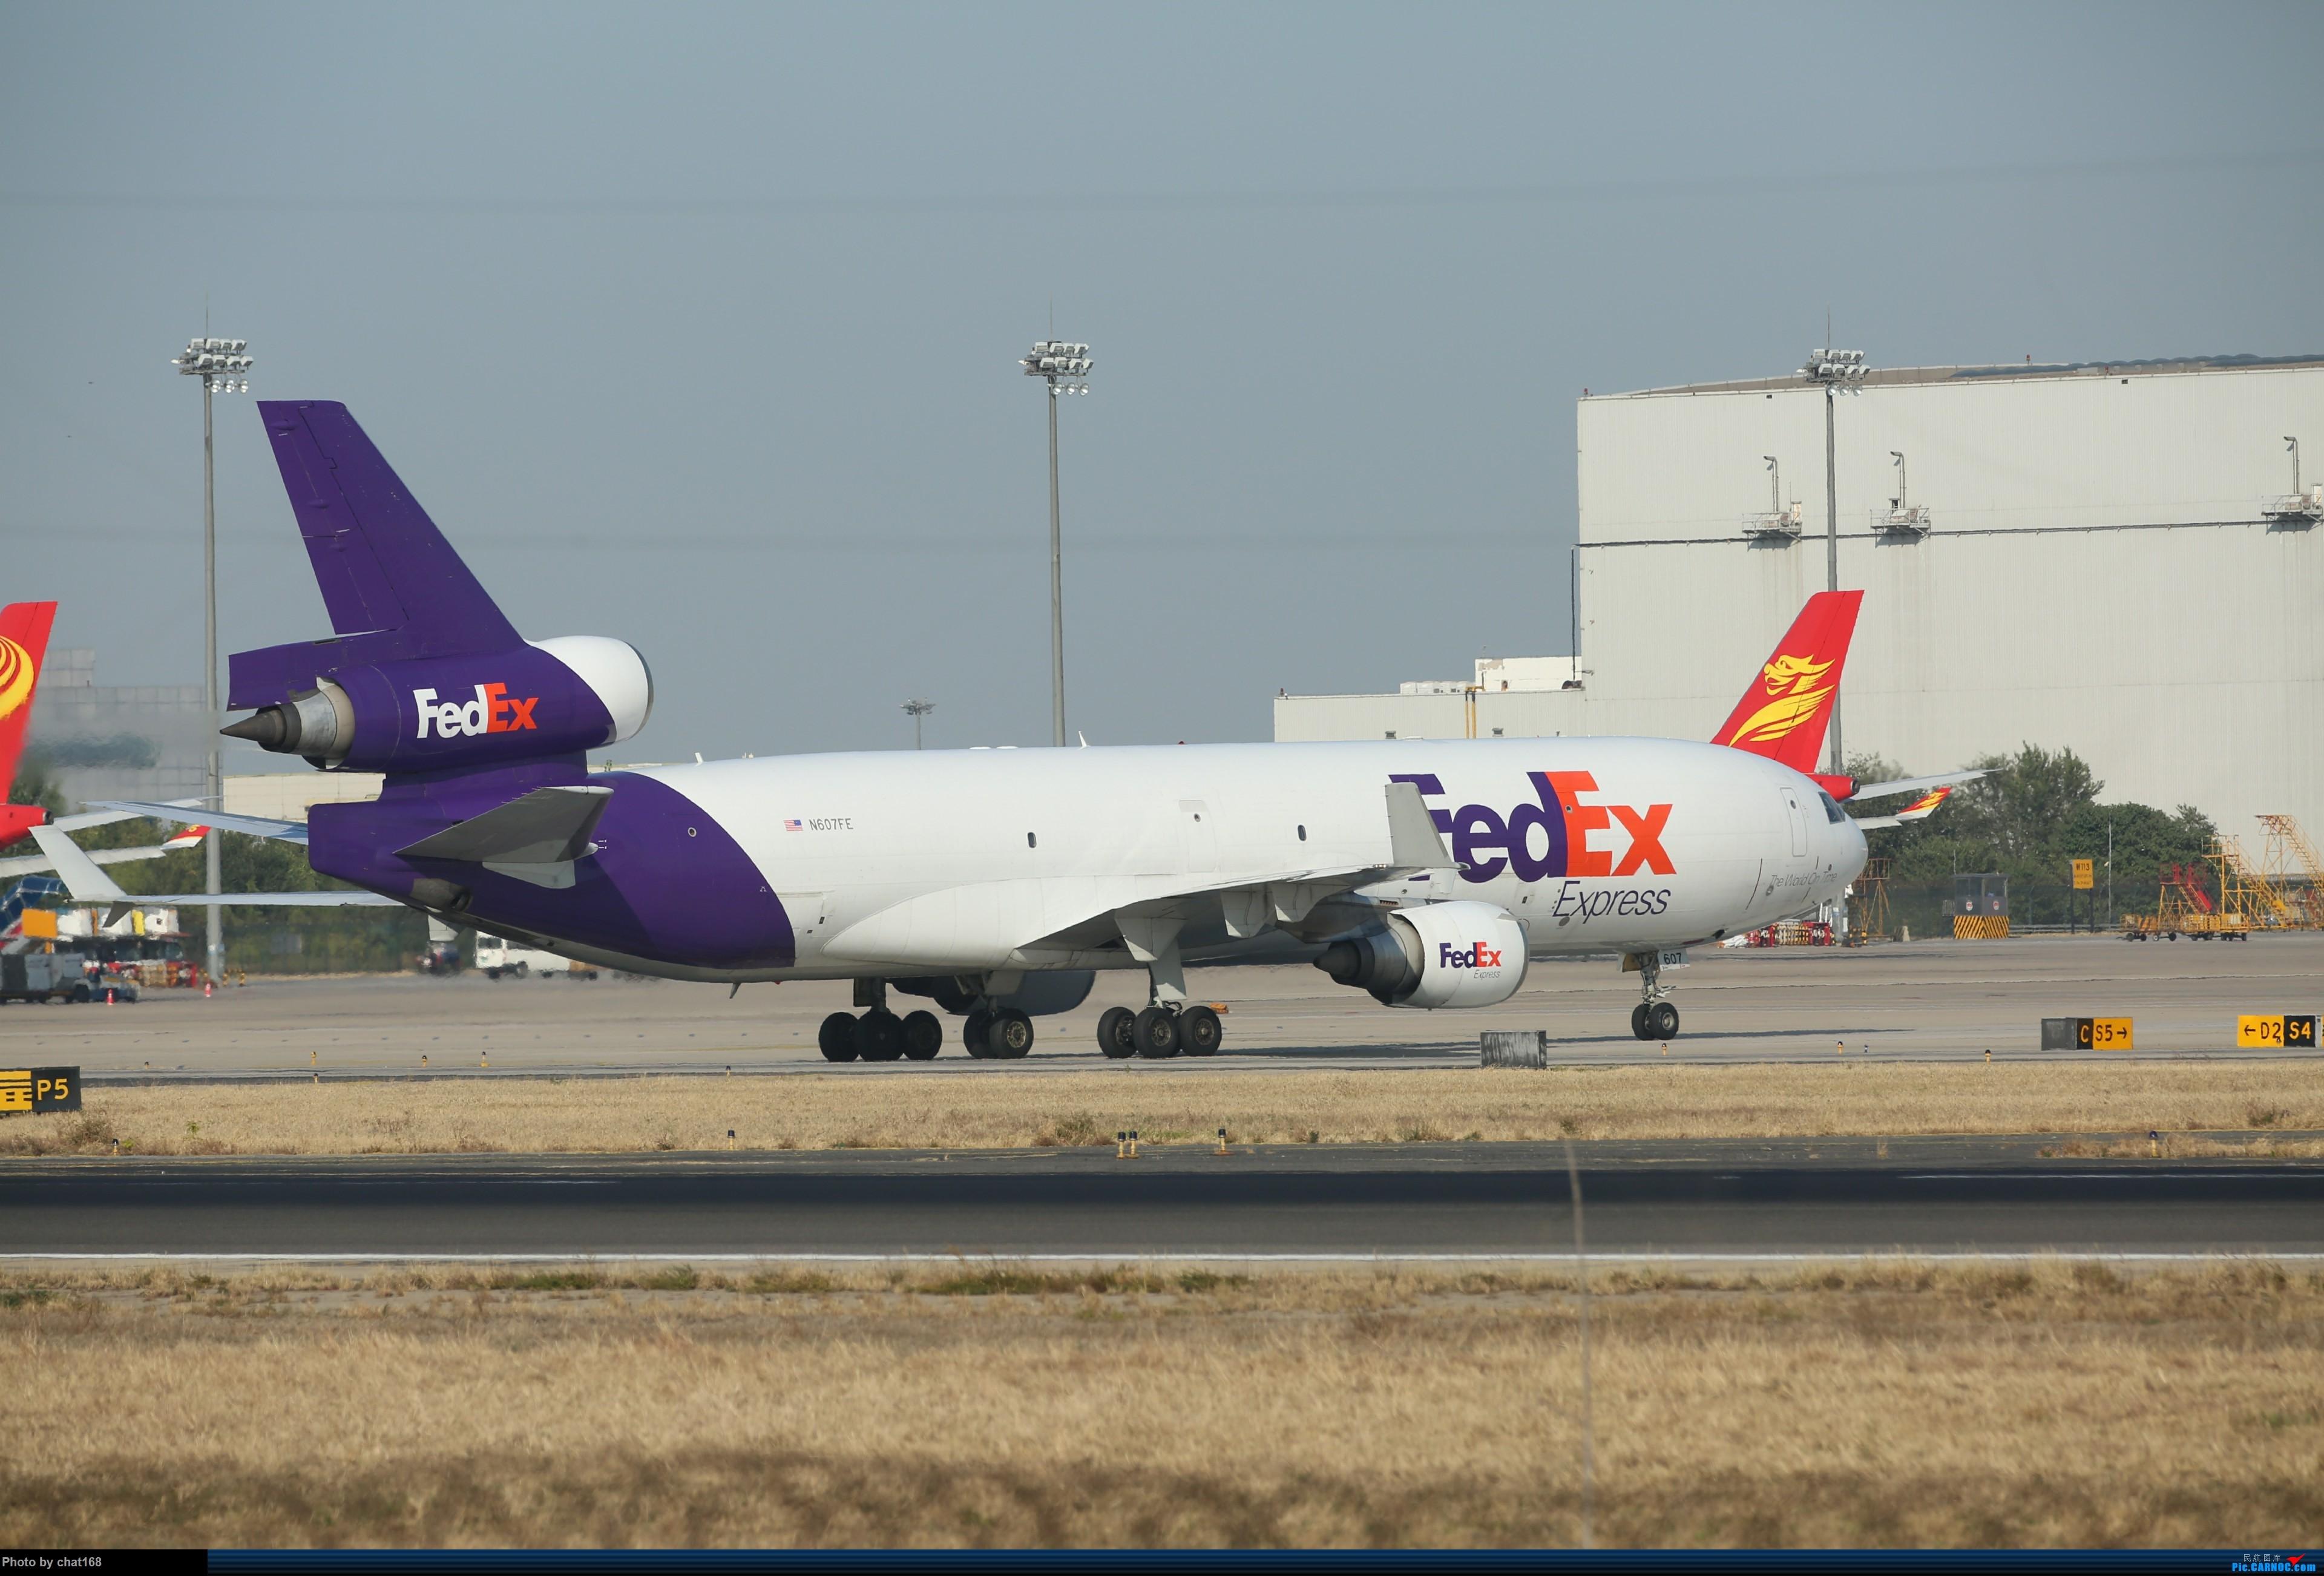 Re:[原创]来一组比较少见的 MD-11 (三发) 照片 MD-11 N-607FE PEK